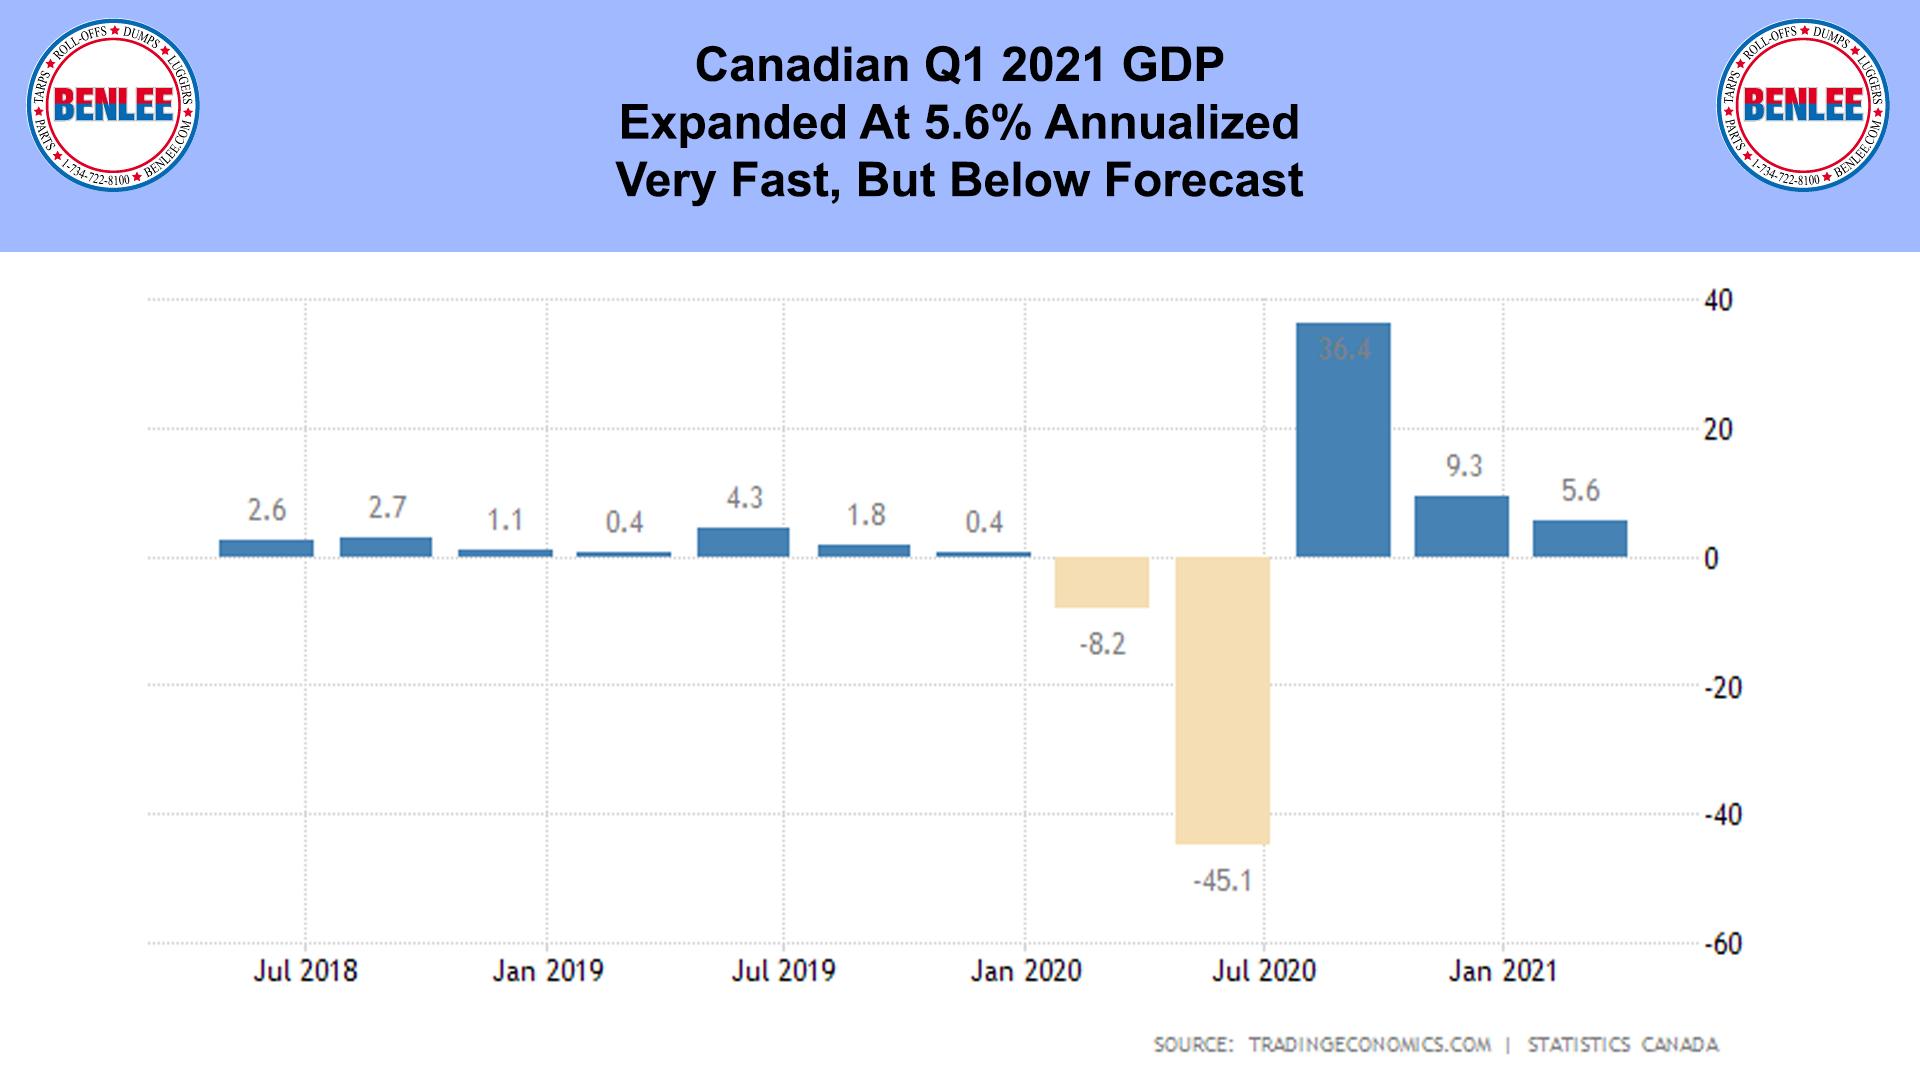 Canadian Q1 2021 GDP